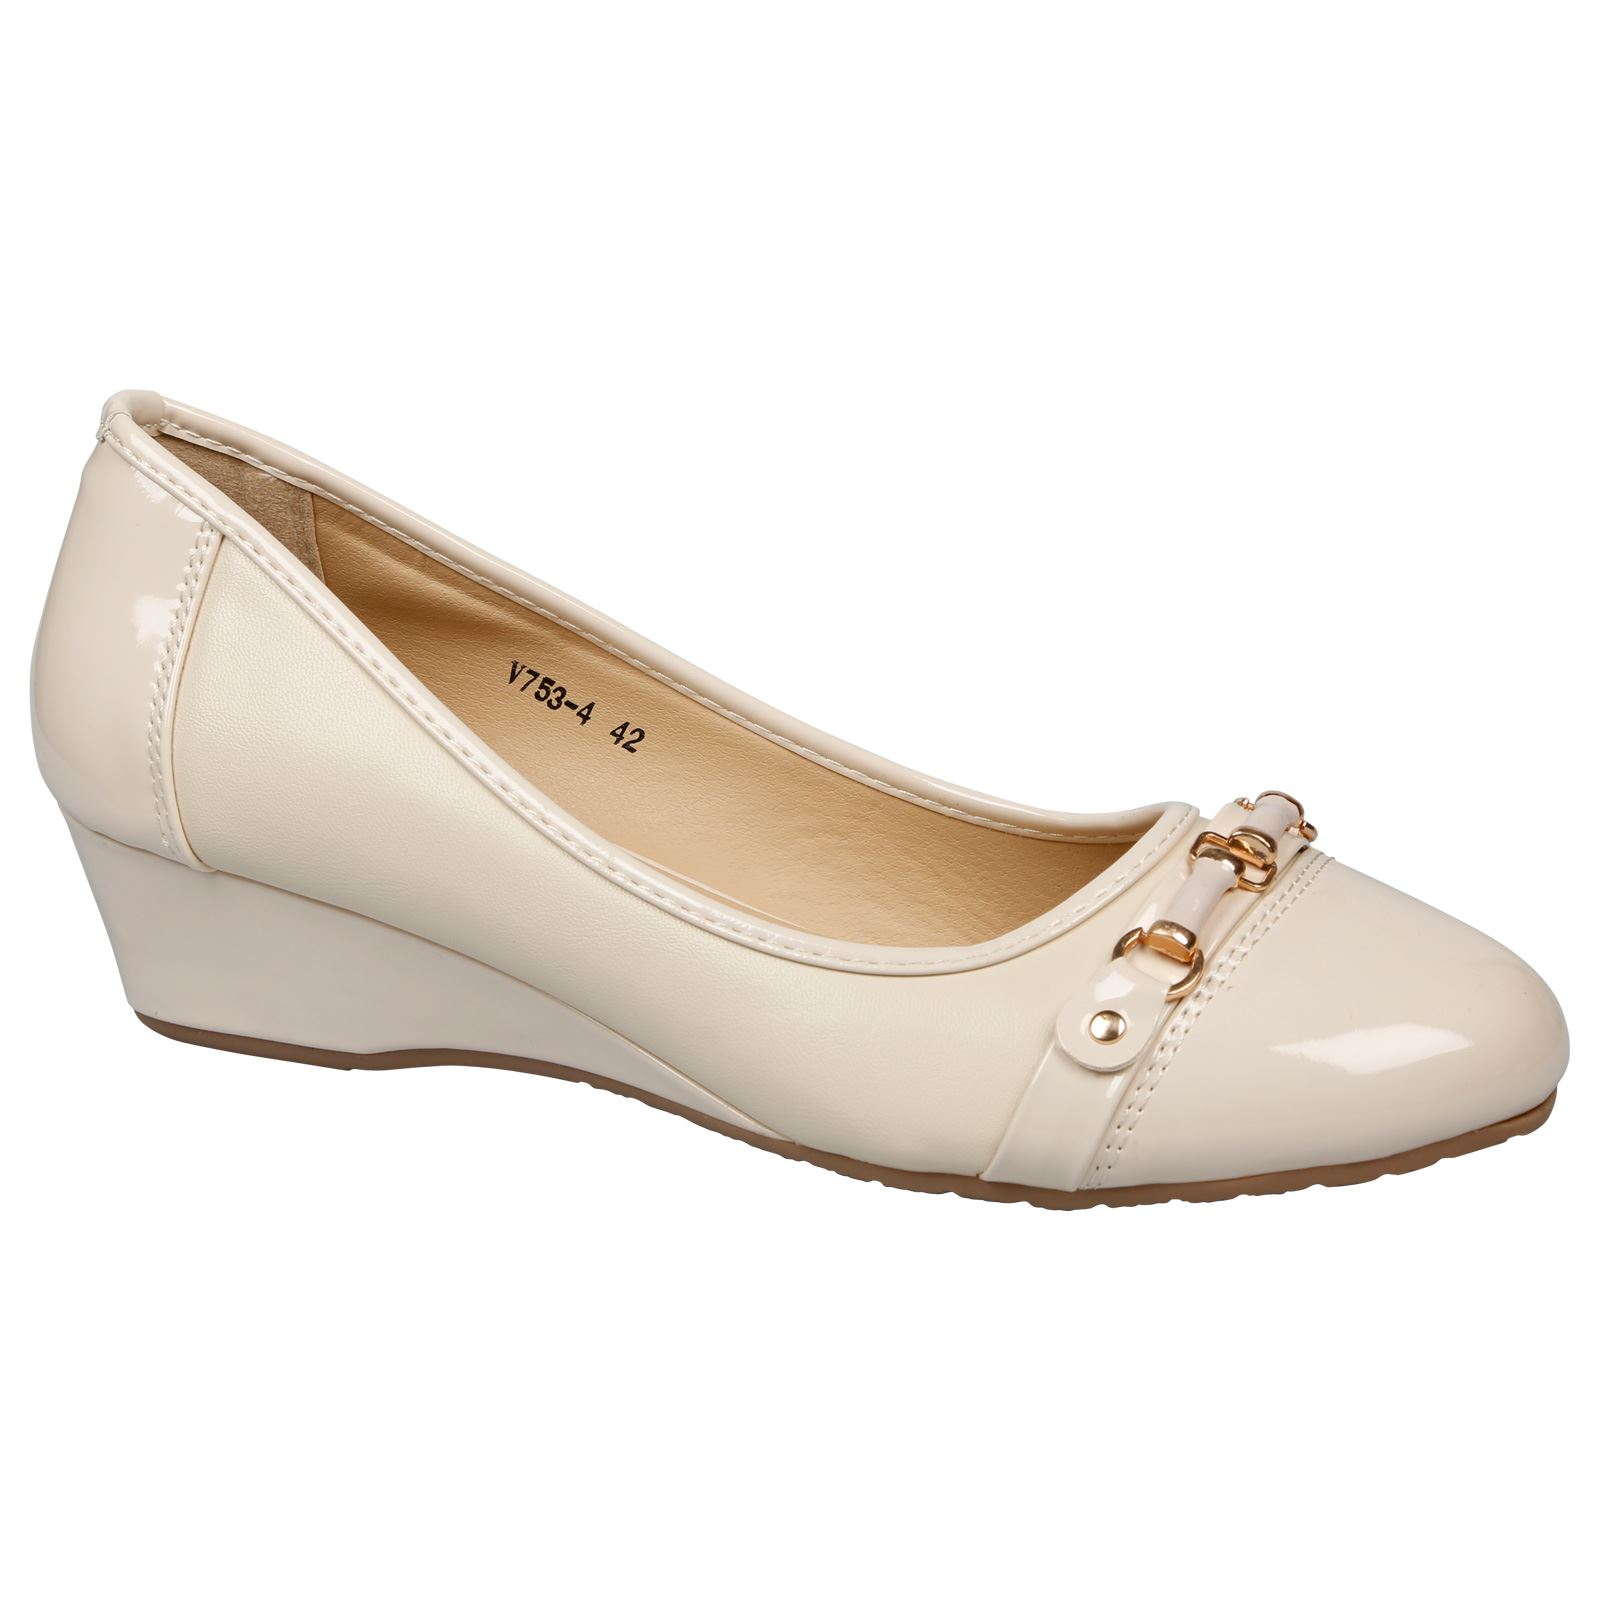 Abrielle Womens Low Wedges Heels Court Shoes Ladies Pumps Large Size UK 7 - 10